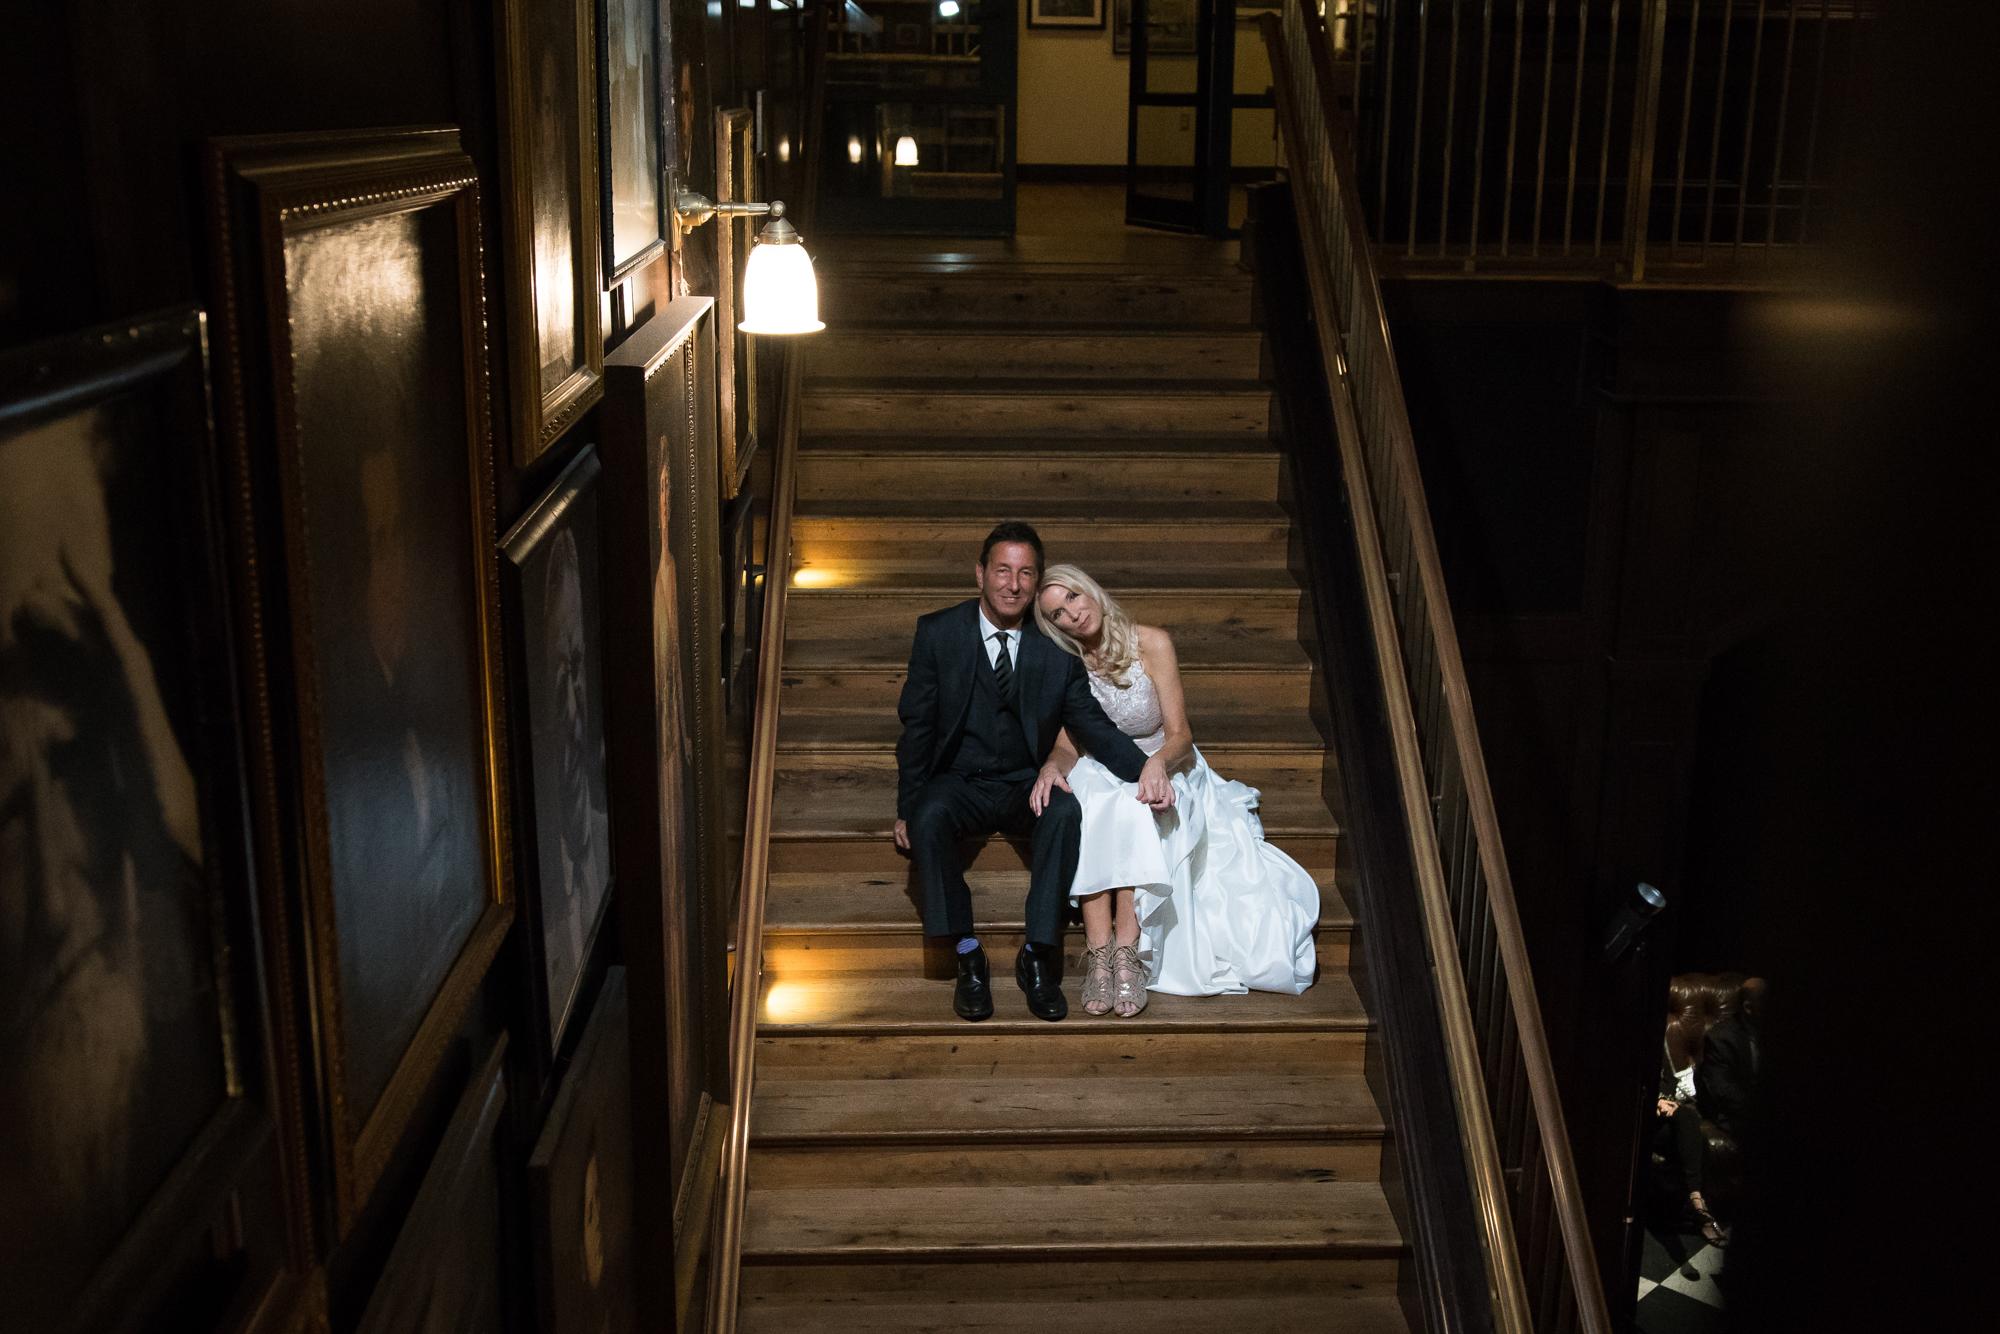 Oxford-Exchange-wedding-photo, Elegant-Wedding-at-the-Oxfprd-Exchange